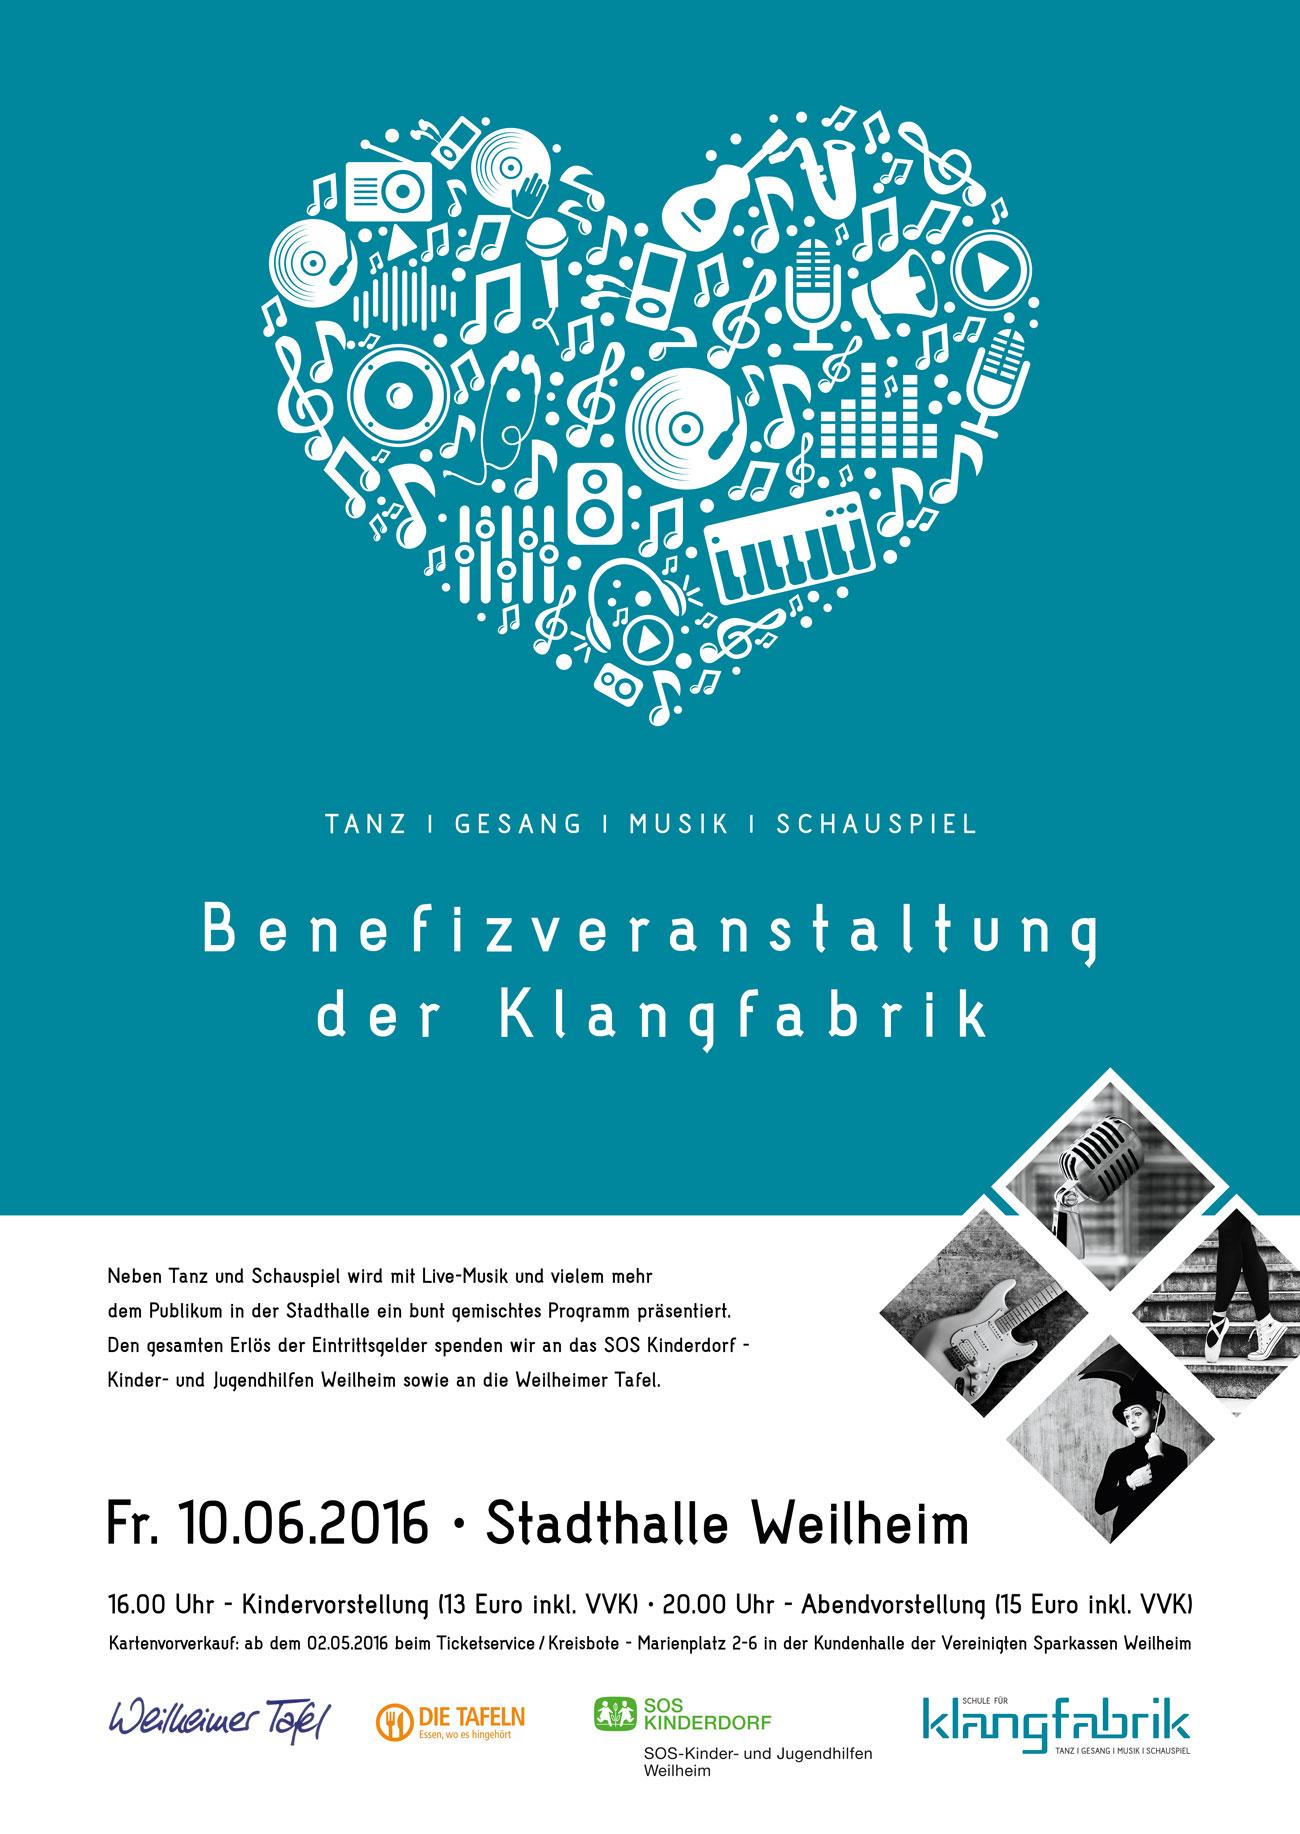 Klangfabrik Benefizveranstaltung